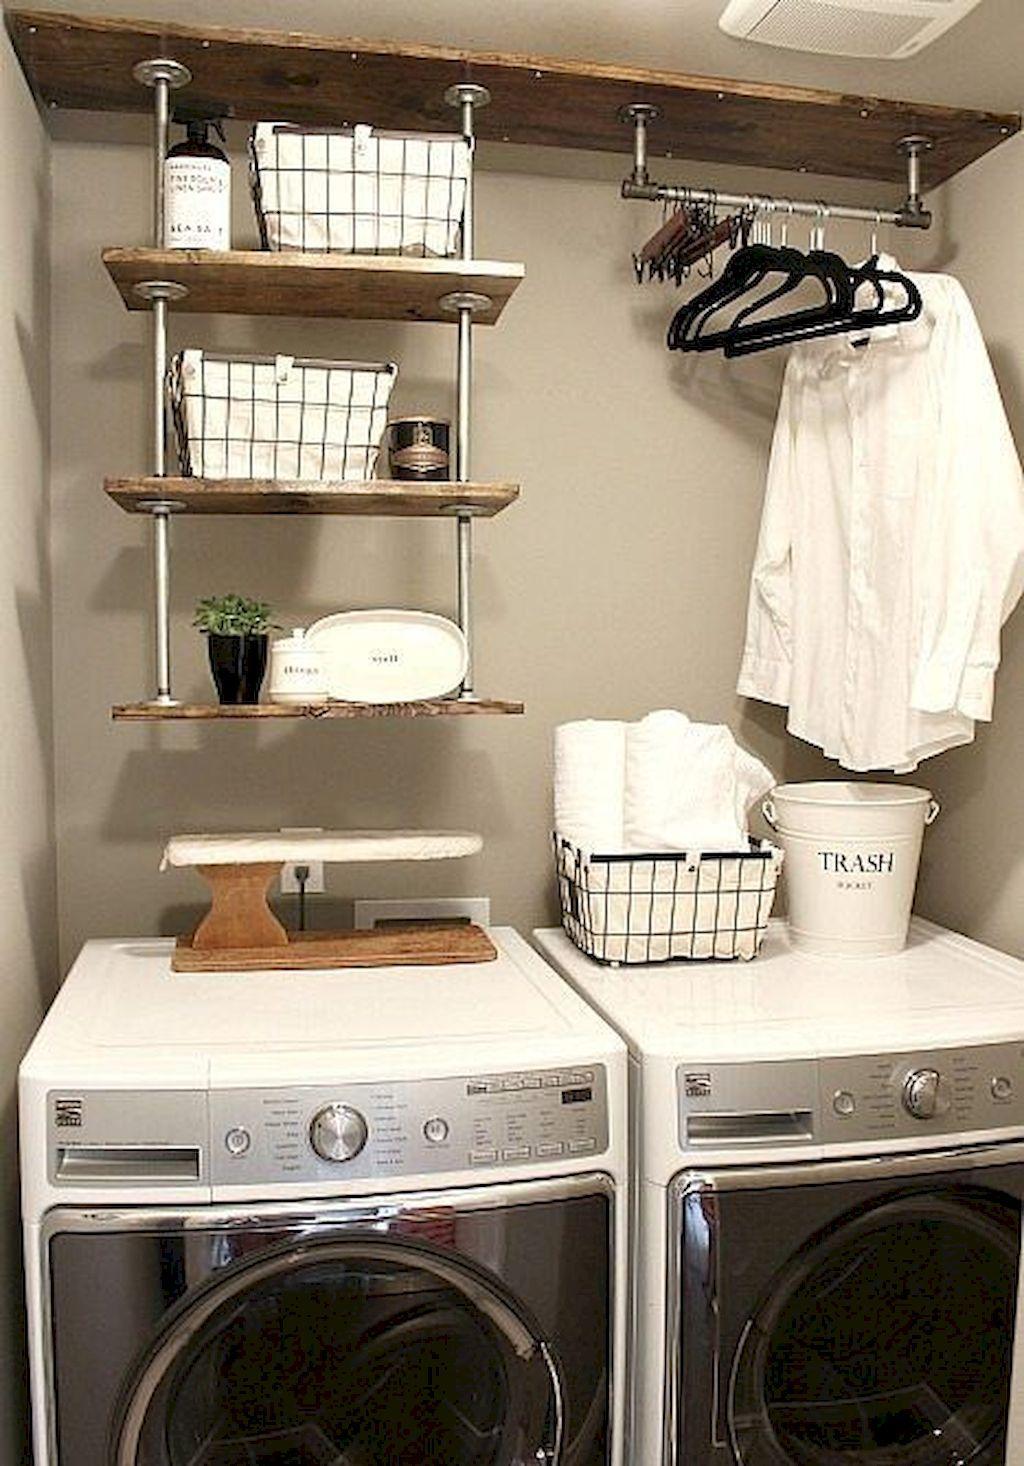 80 Diy Laundry Room Storage Shelves Ideas Setyouroom Com Small Laundry Room Organization Laundry Room Shelves Tiny Laundry Rooms